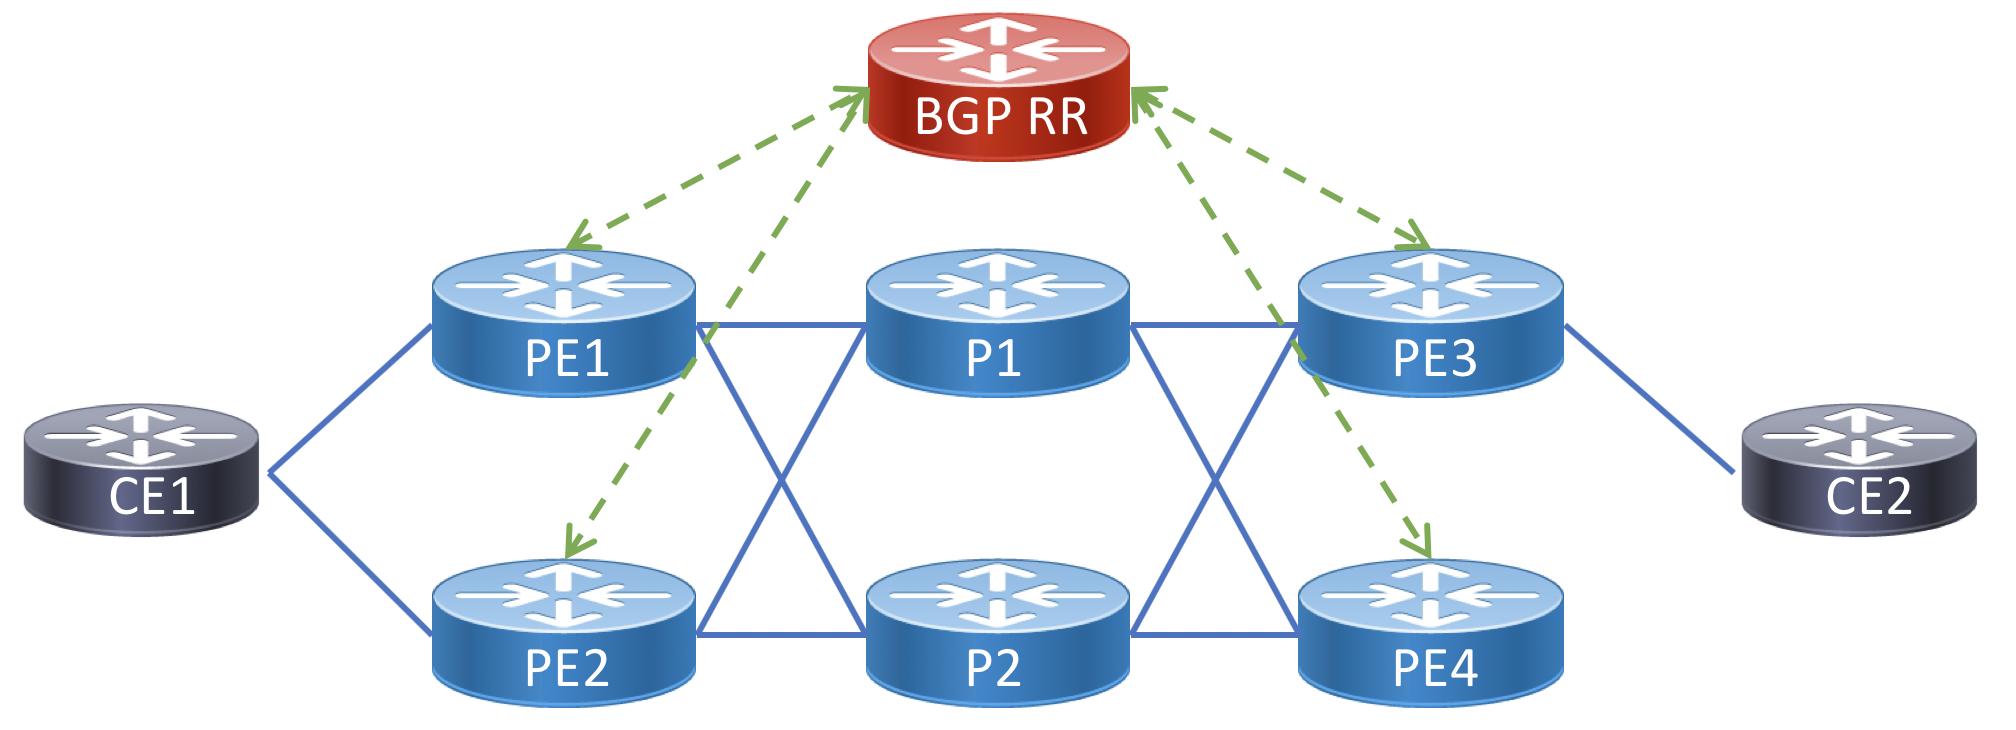 ixp-base-topology.png